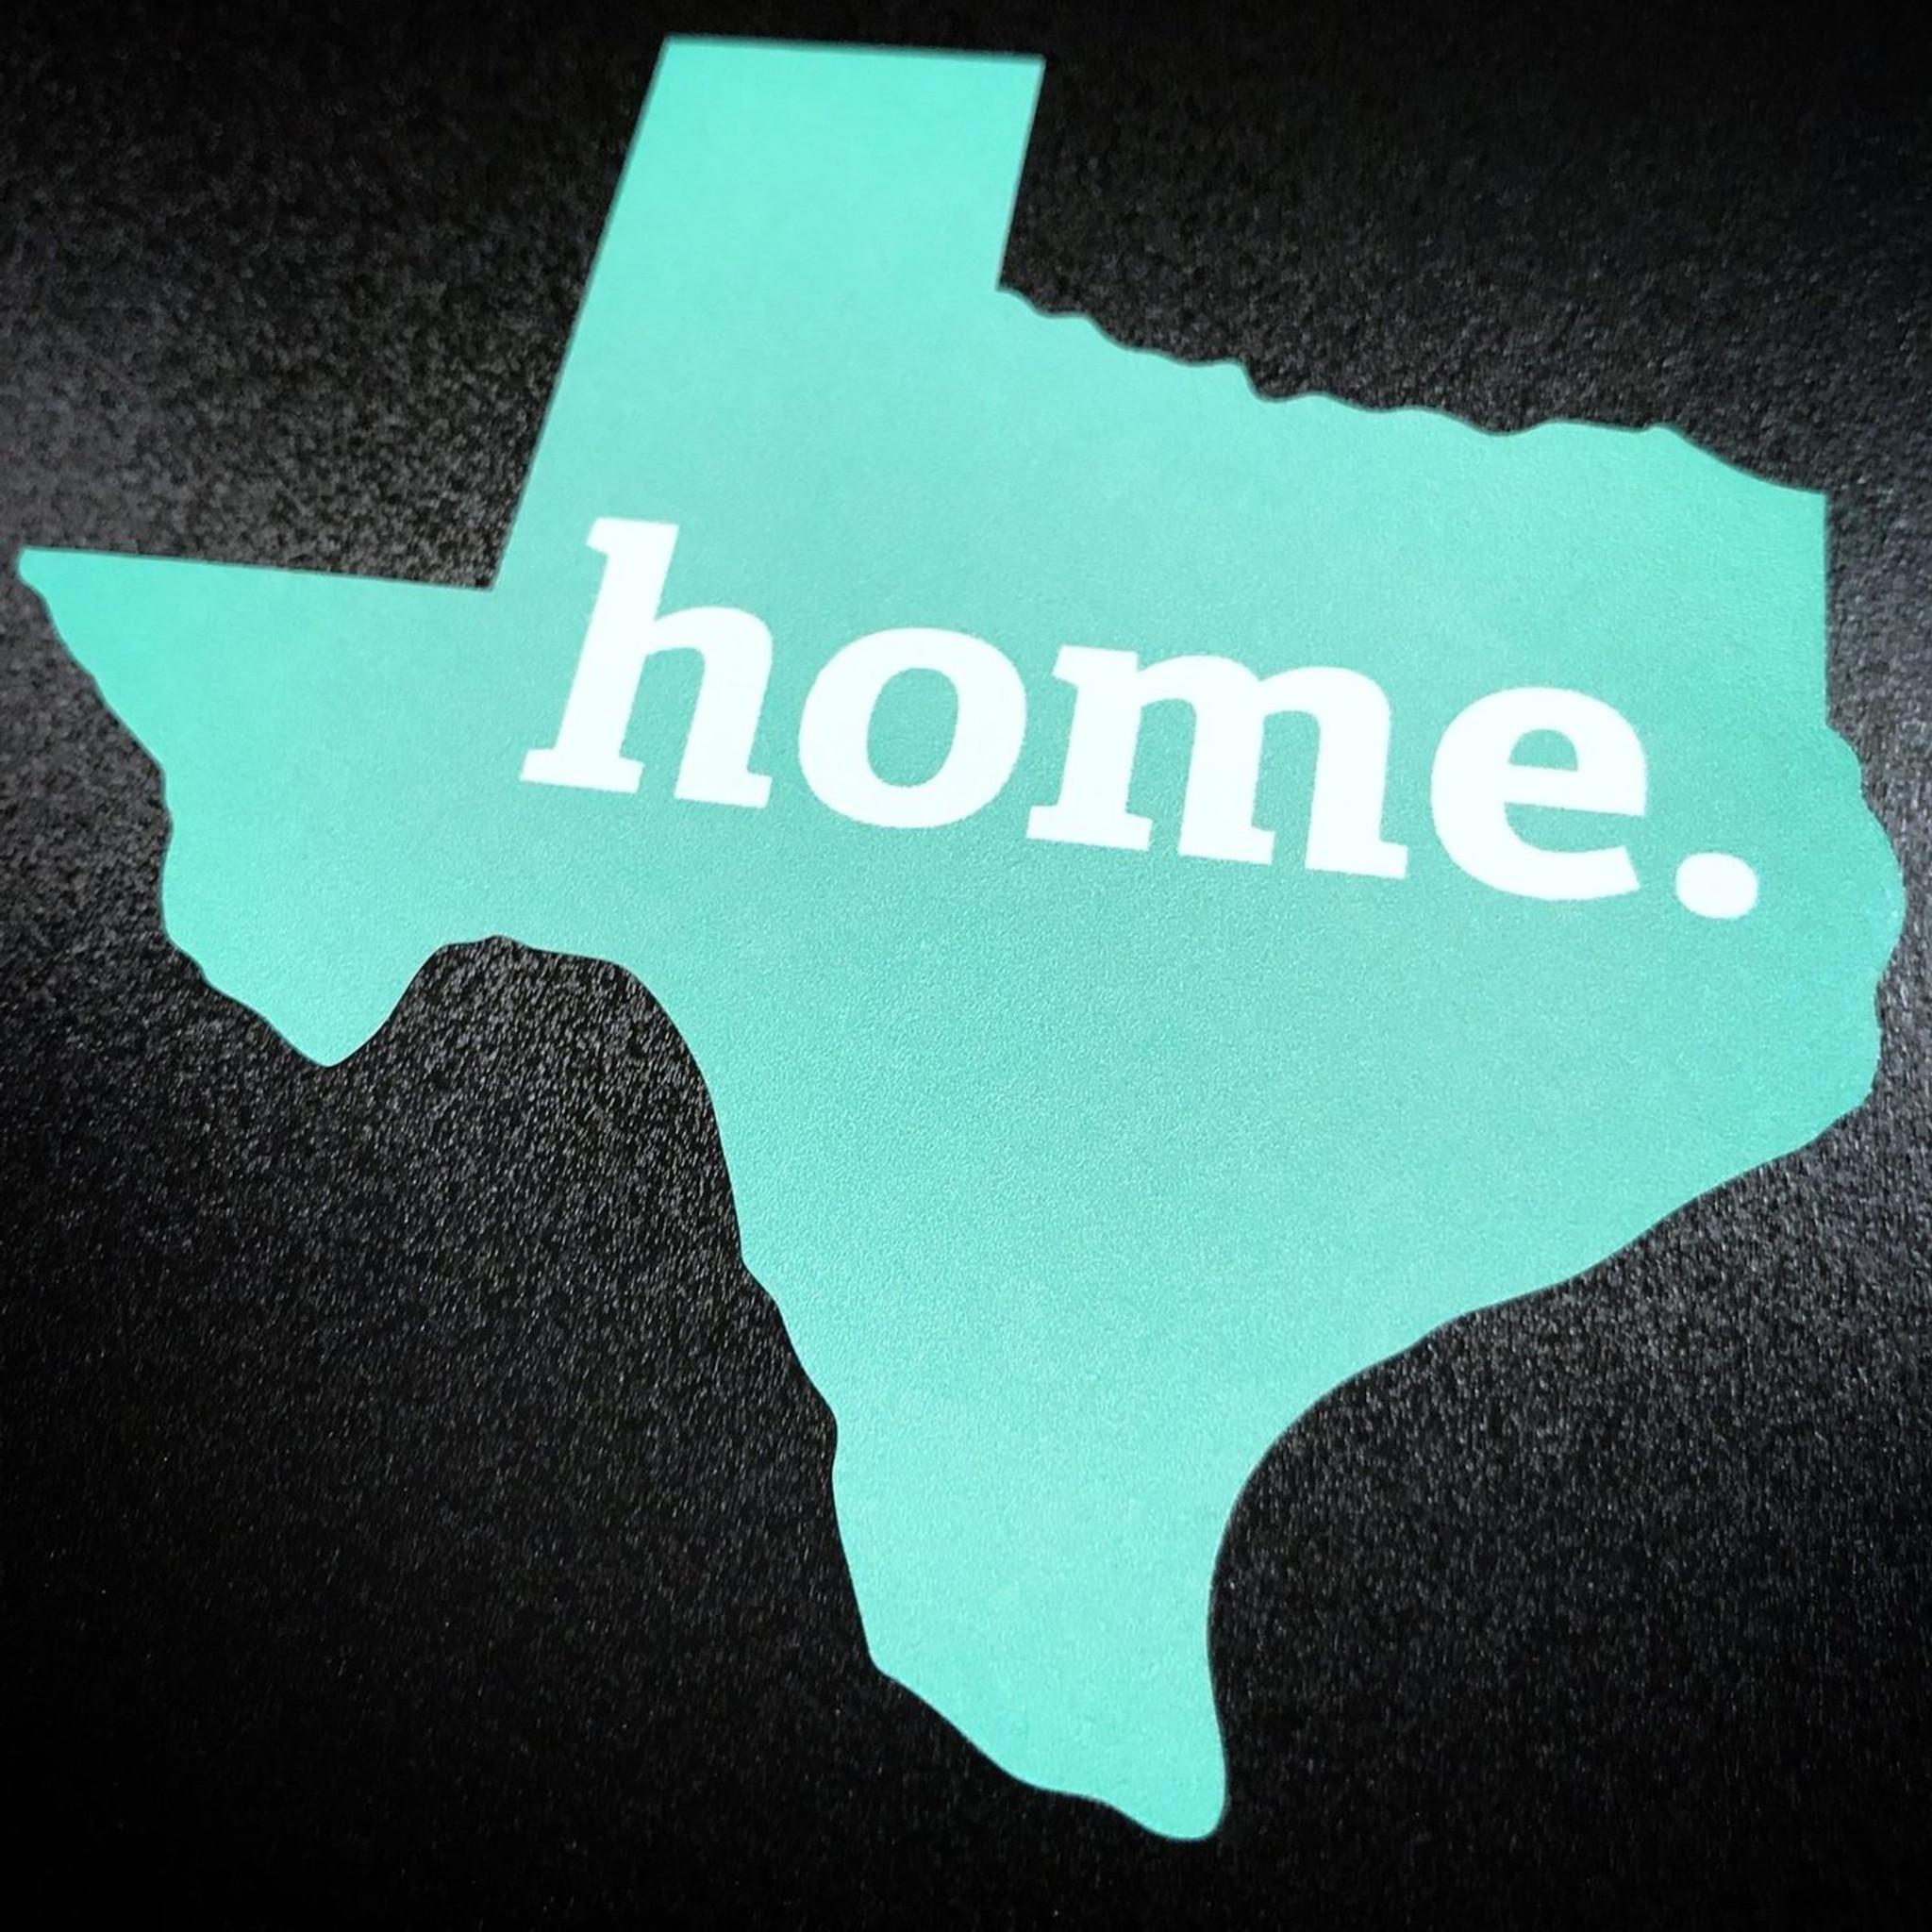 Texas Mint Home - Sticker on south carolina home logo, oklahoma home logo, denton logo, houston logo, las vegas home logo, amarillo logo, corpus christi logo, richmond home logo, lubbock logo, lexington home logo, legacy home logo, north dakota logo, kentucky home logo, new mexico logo, nc home logo, nebraska home logo, california home logo, fort worth logo, pennsylvania logo, montana home logo,